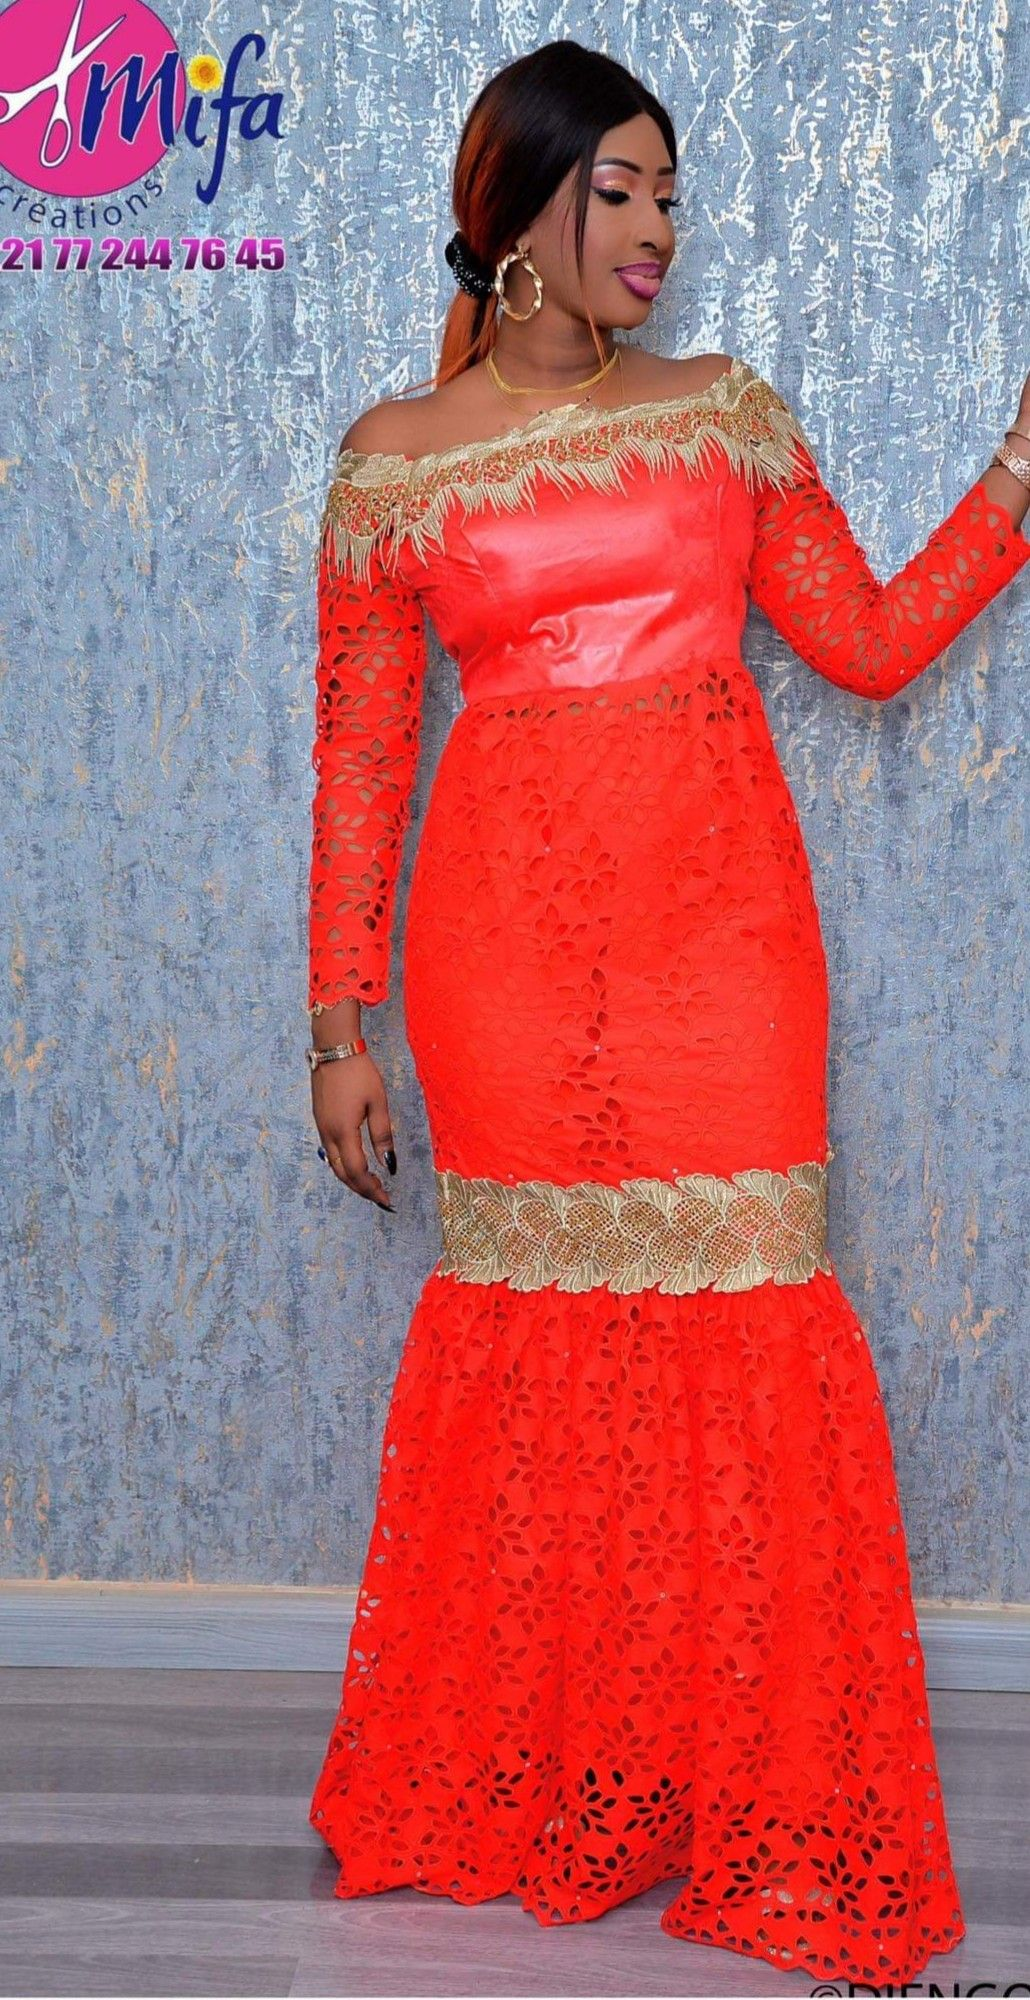 B Robe African Fashion African Attire African Print Dress Designs